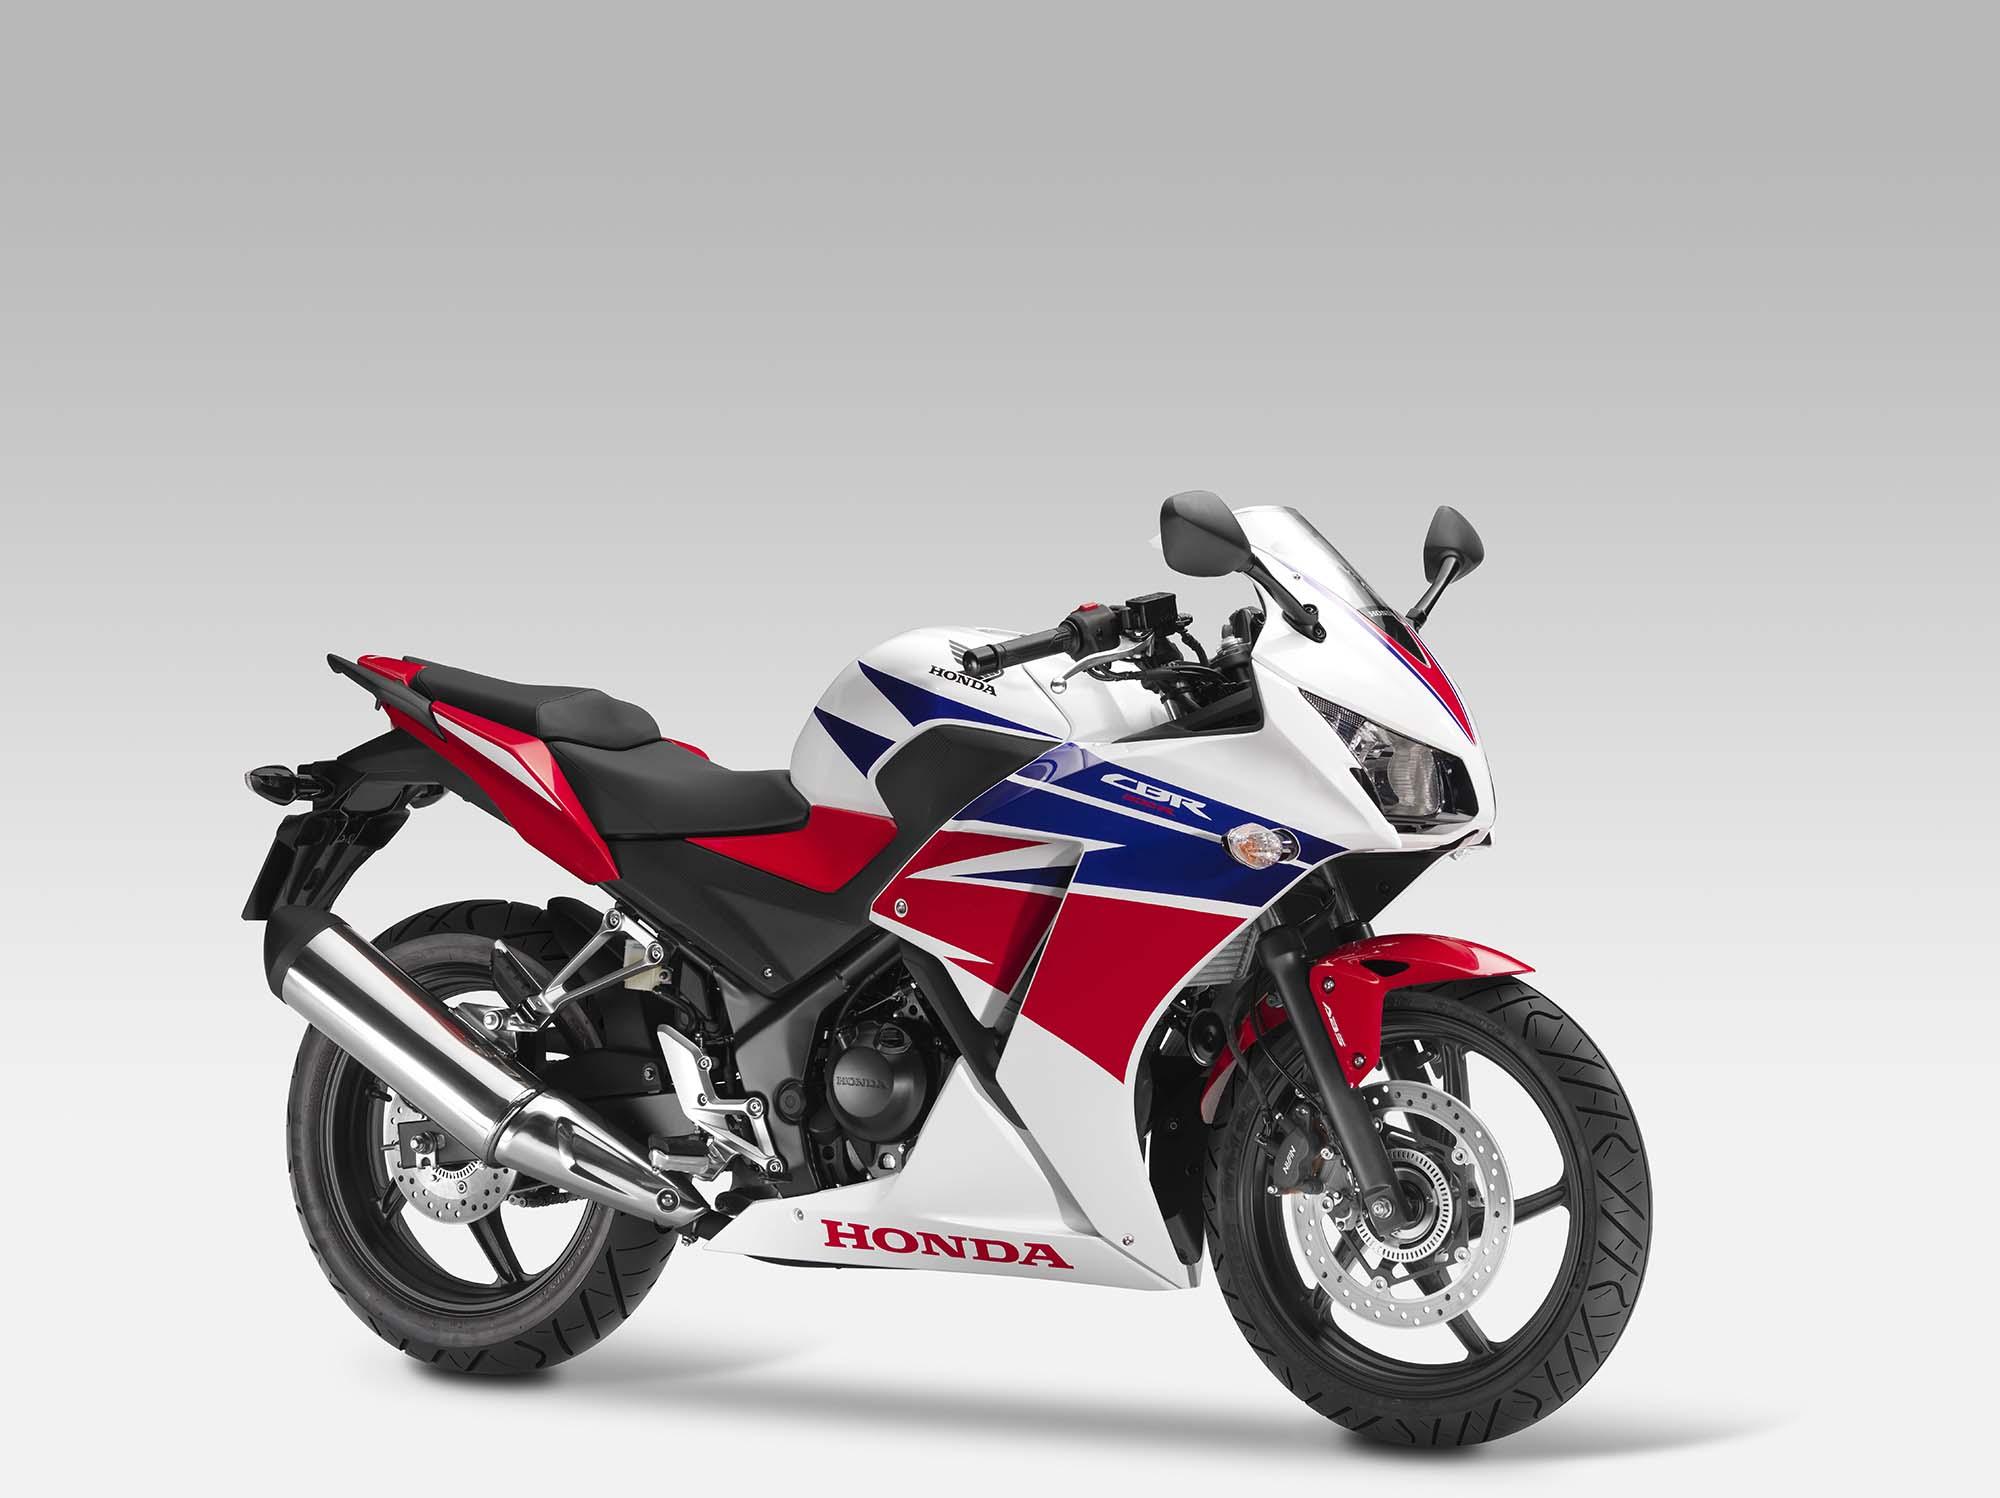 2014 Honda Cbr300r Replaces The Cbr250r Autoevolution